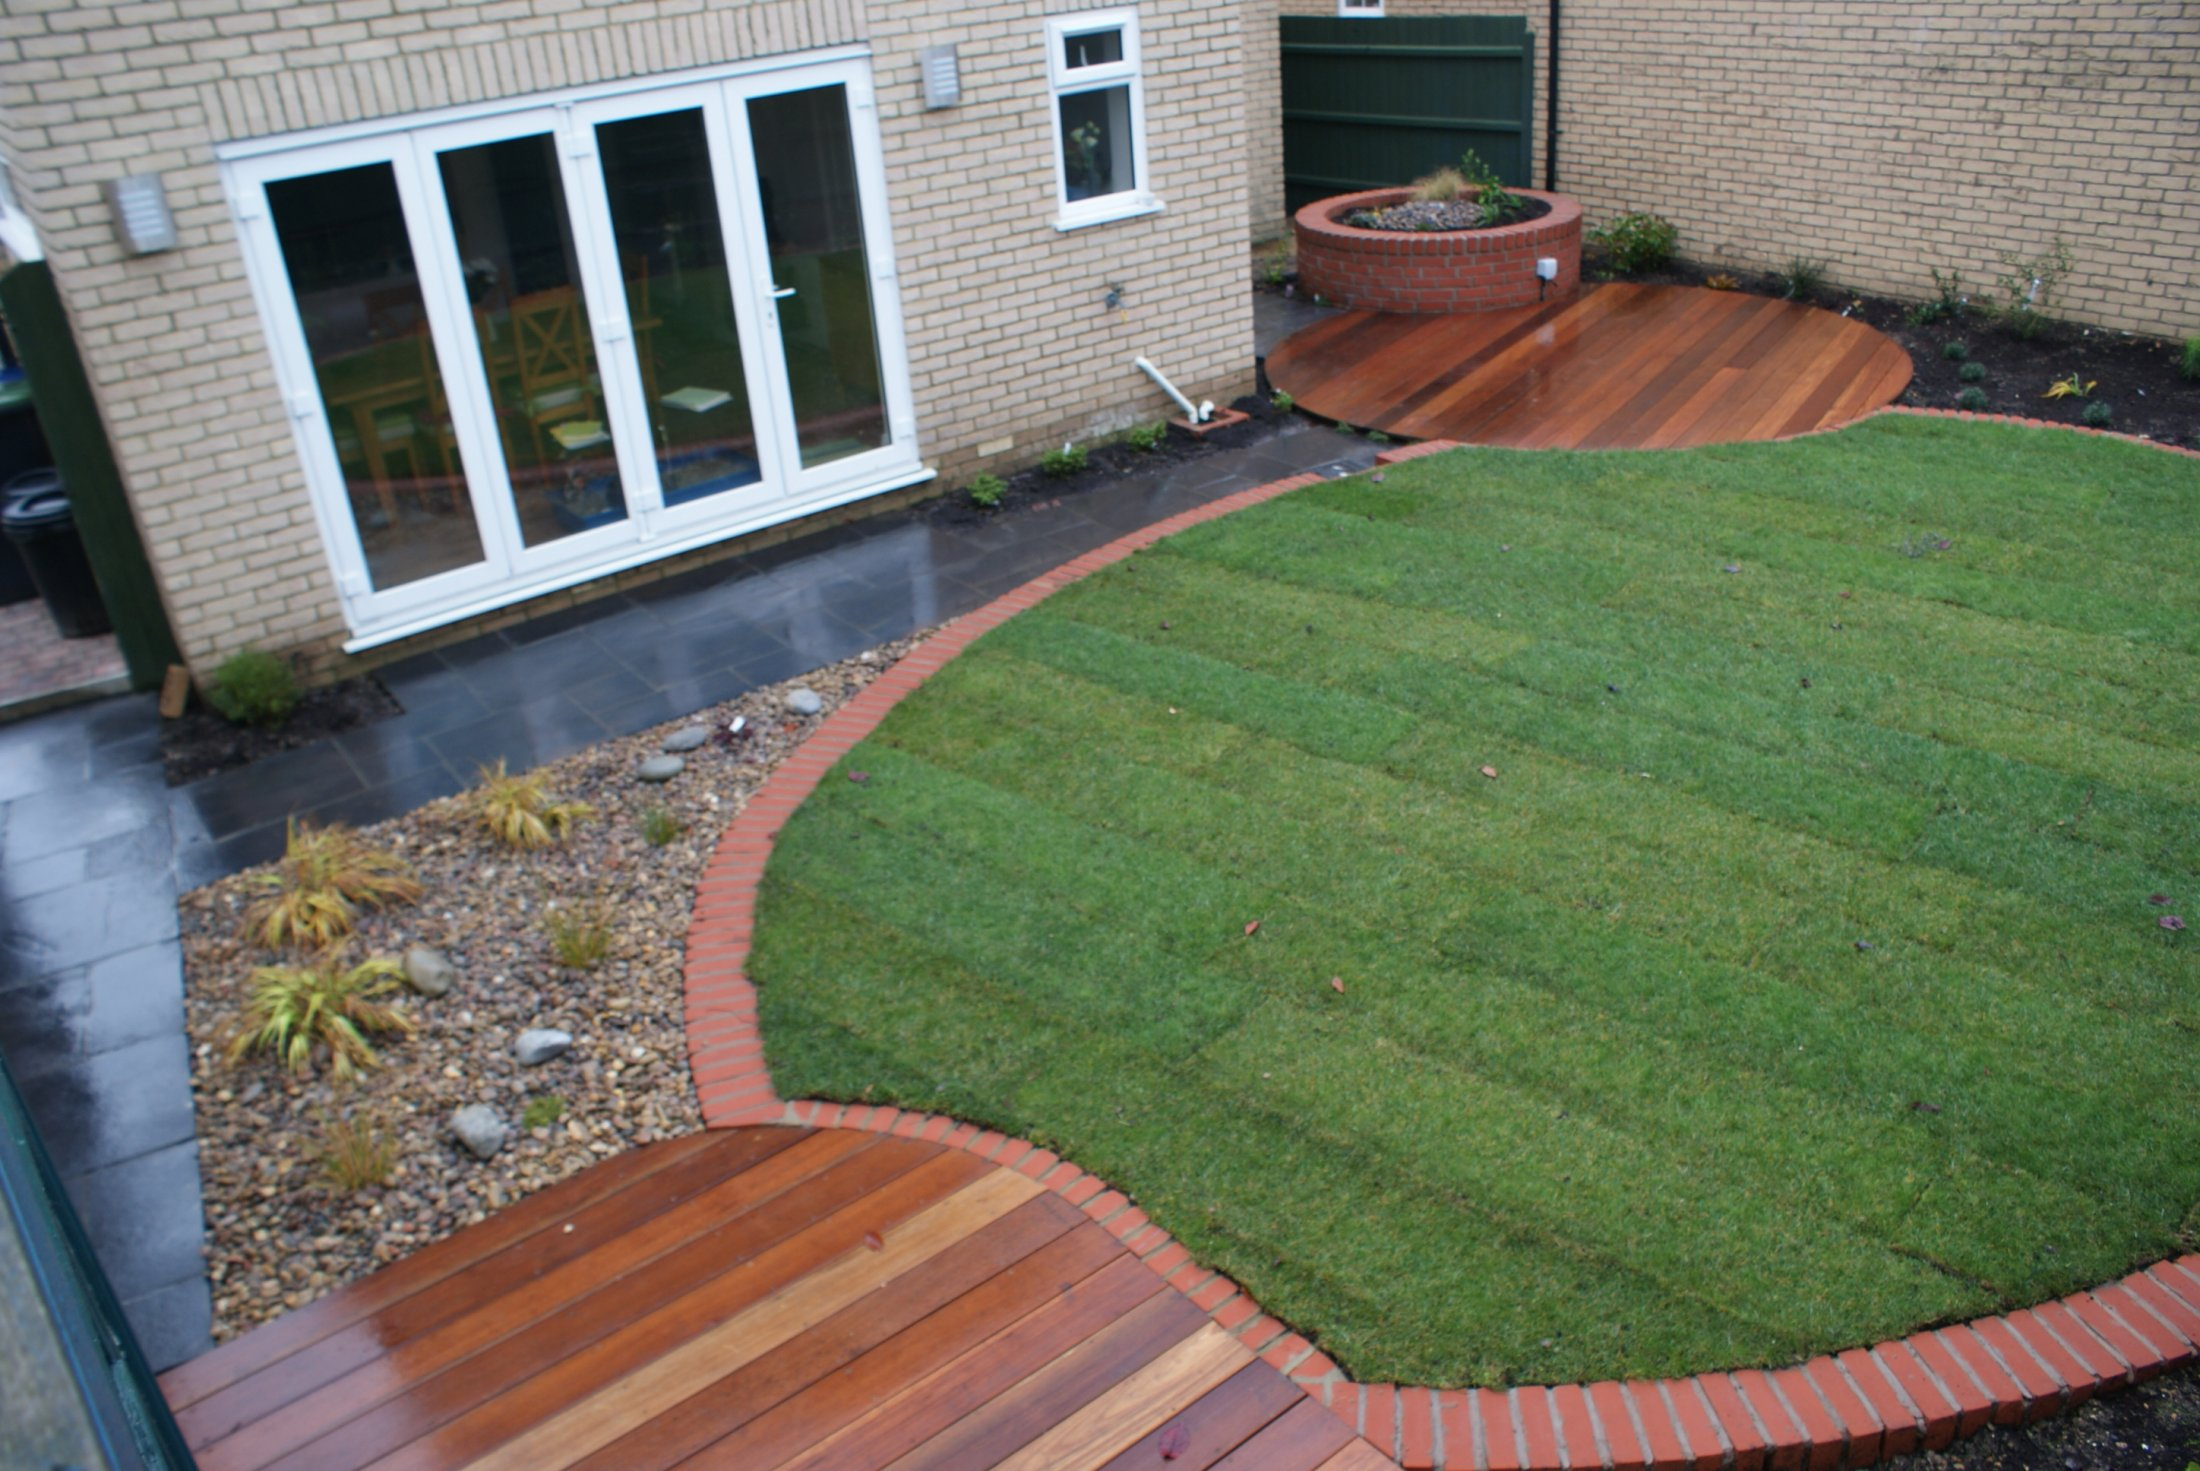 Circular garden design with hardwood decking in Ely